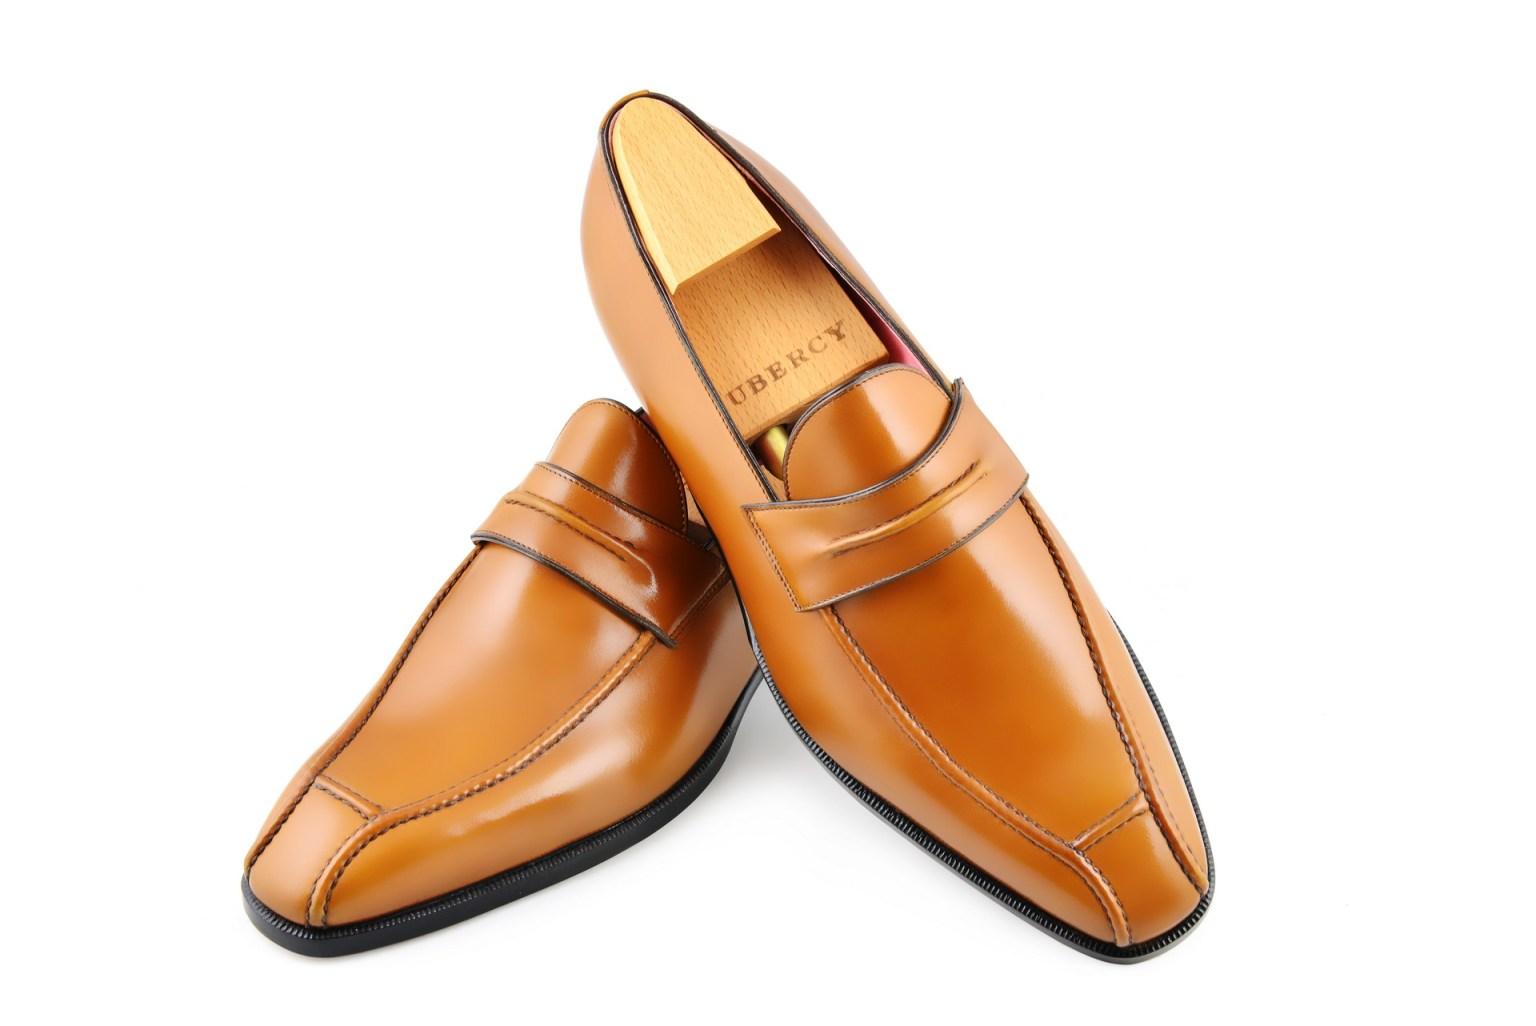 Le mocassin loafer Janus en cuir fauve